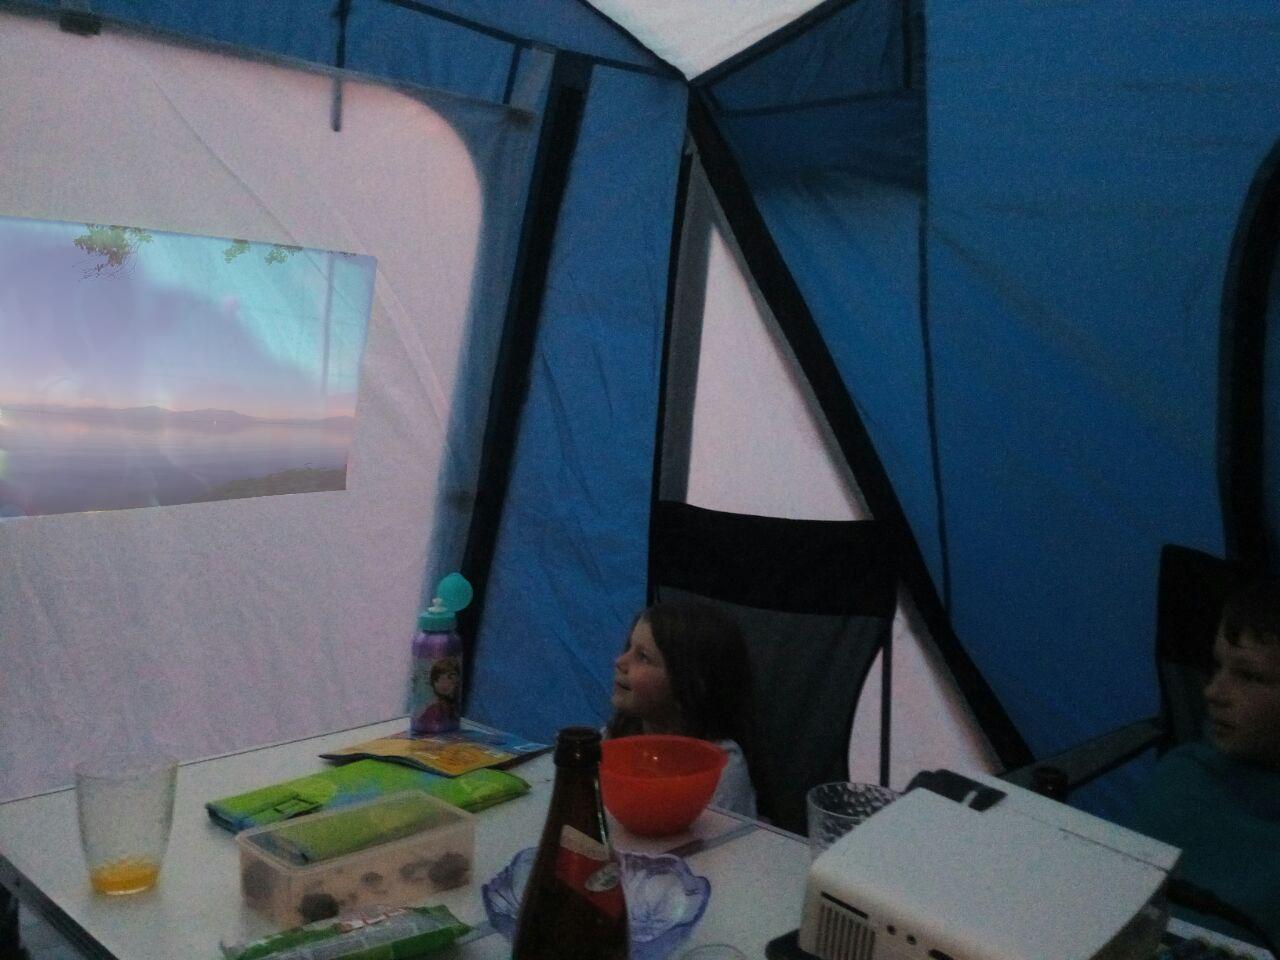 Kino Auf Dem Campingplatz | Matzaton